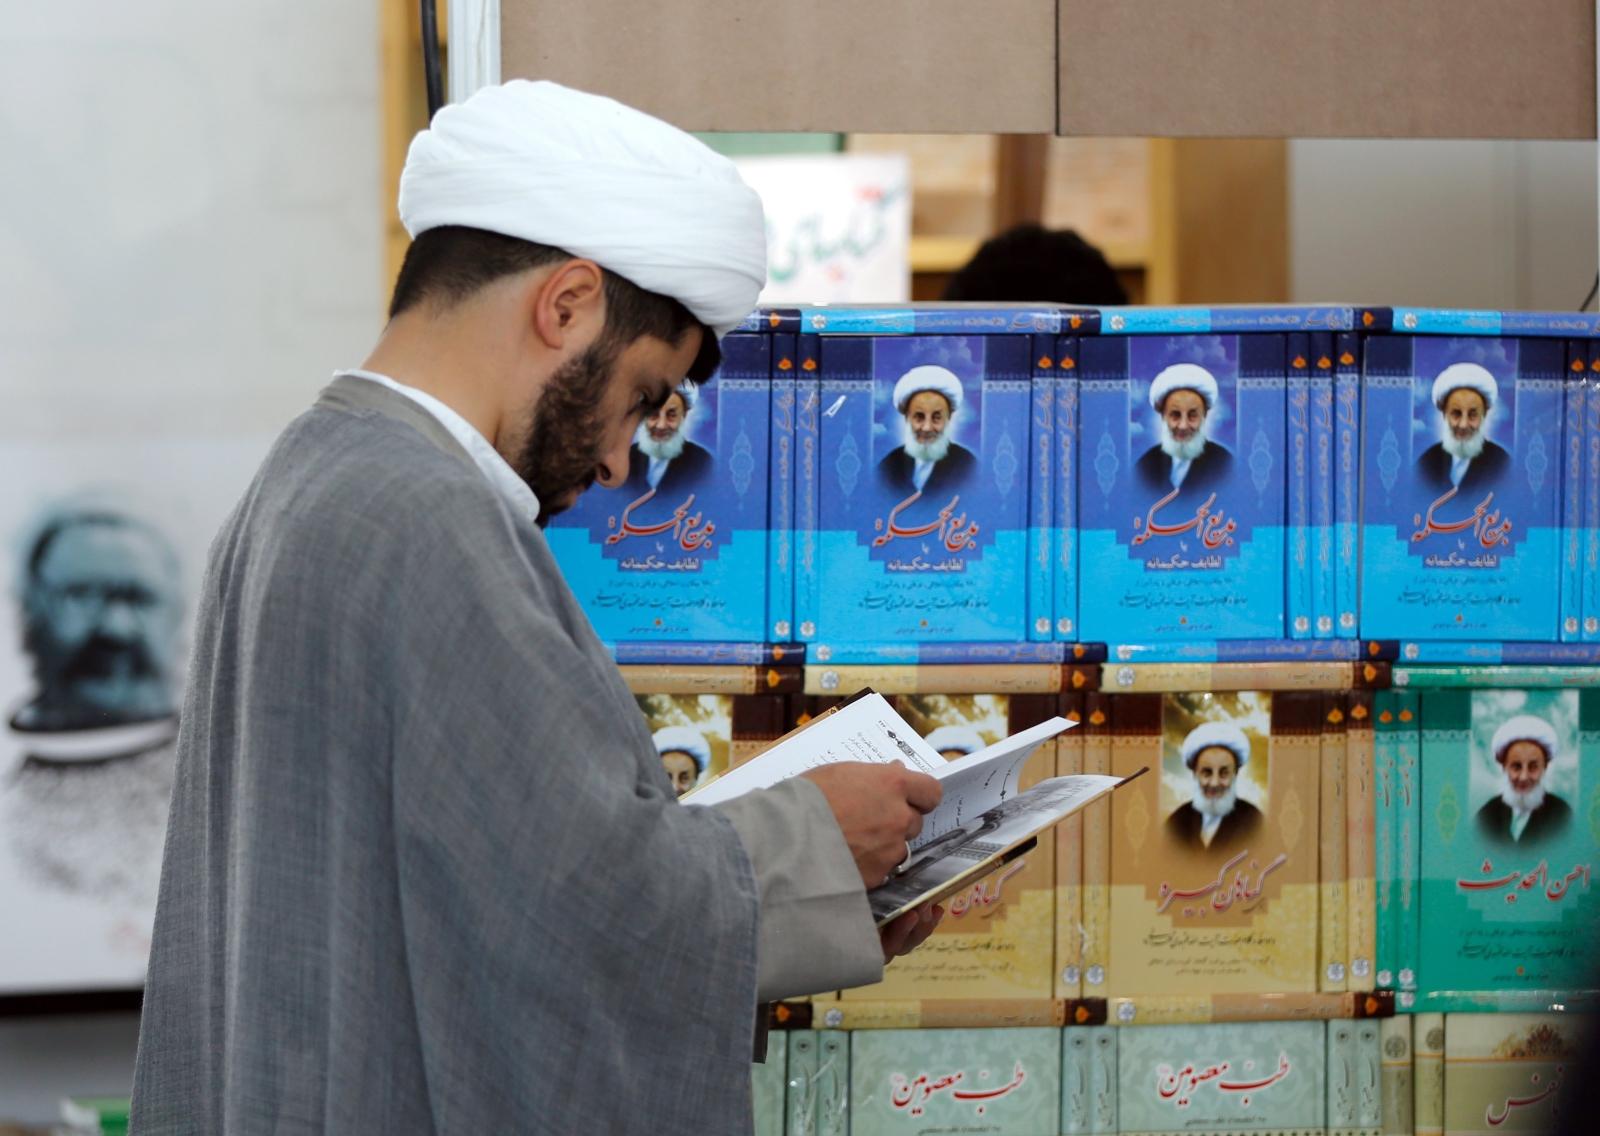 Targi książki w Iranie. EPA/ABEDIN TAHERKENAREH Dostawca: PAP/EPA.